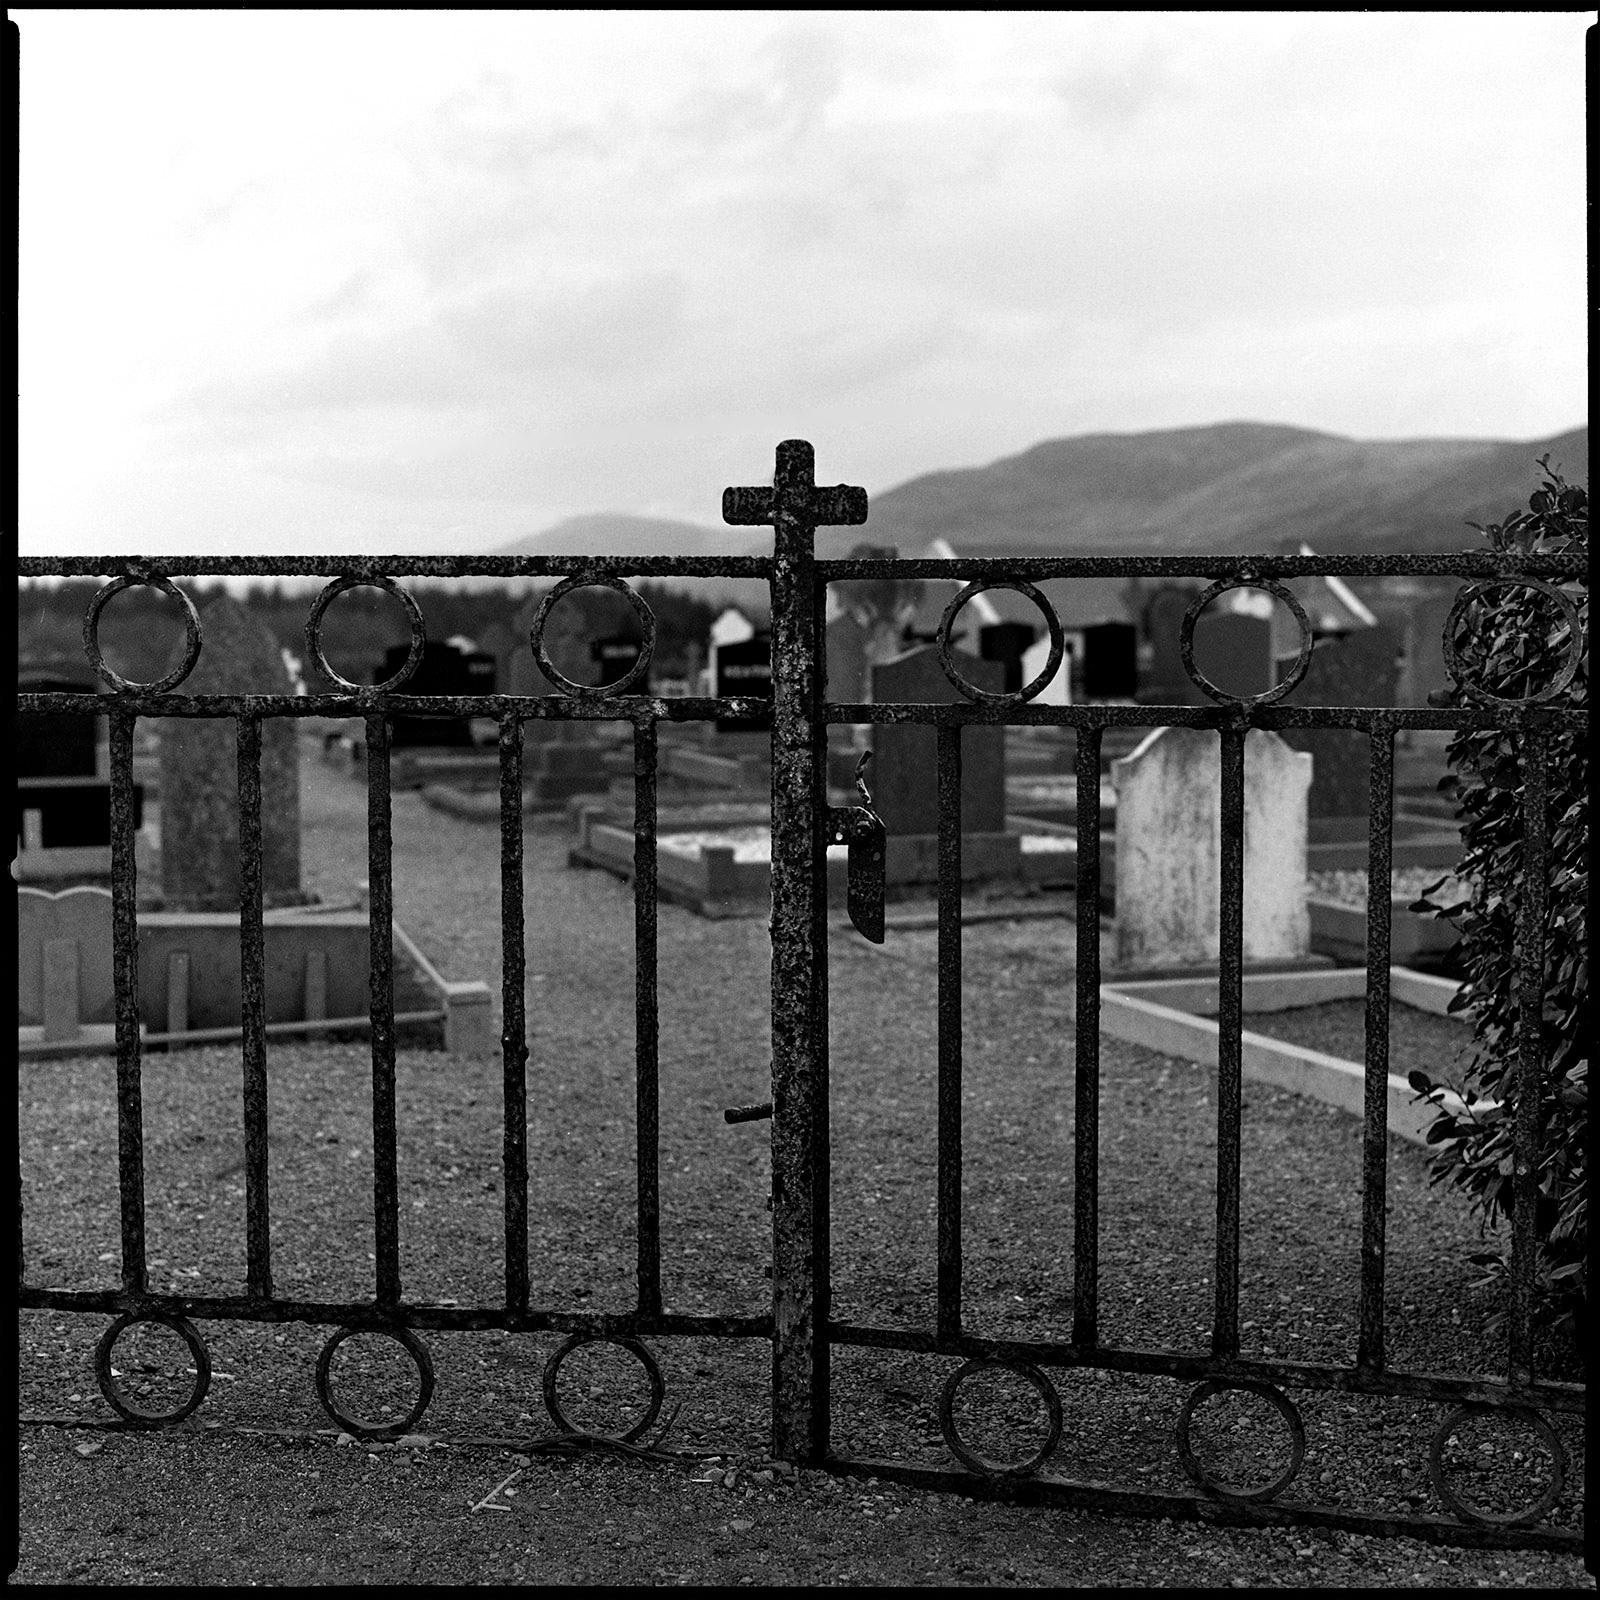 Co. Kerry, Ireland—2007